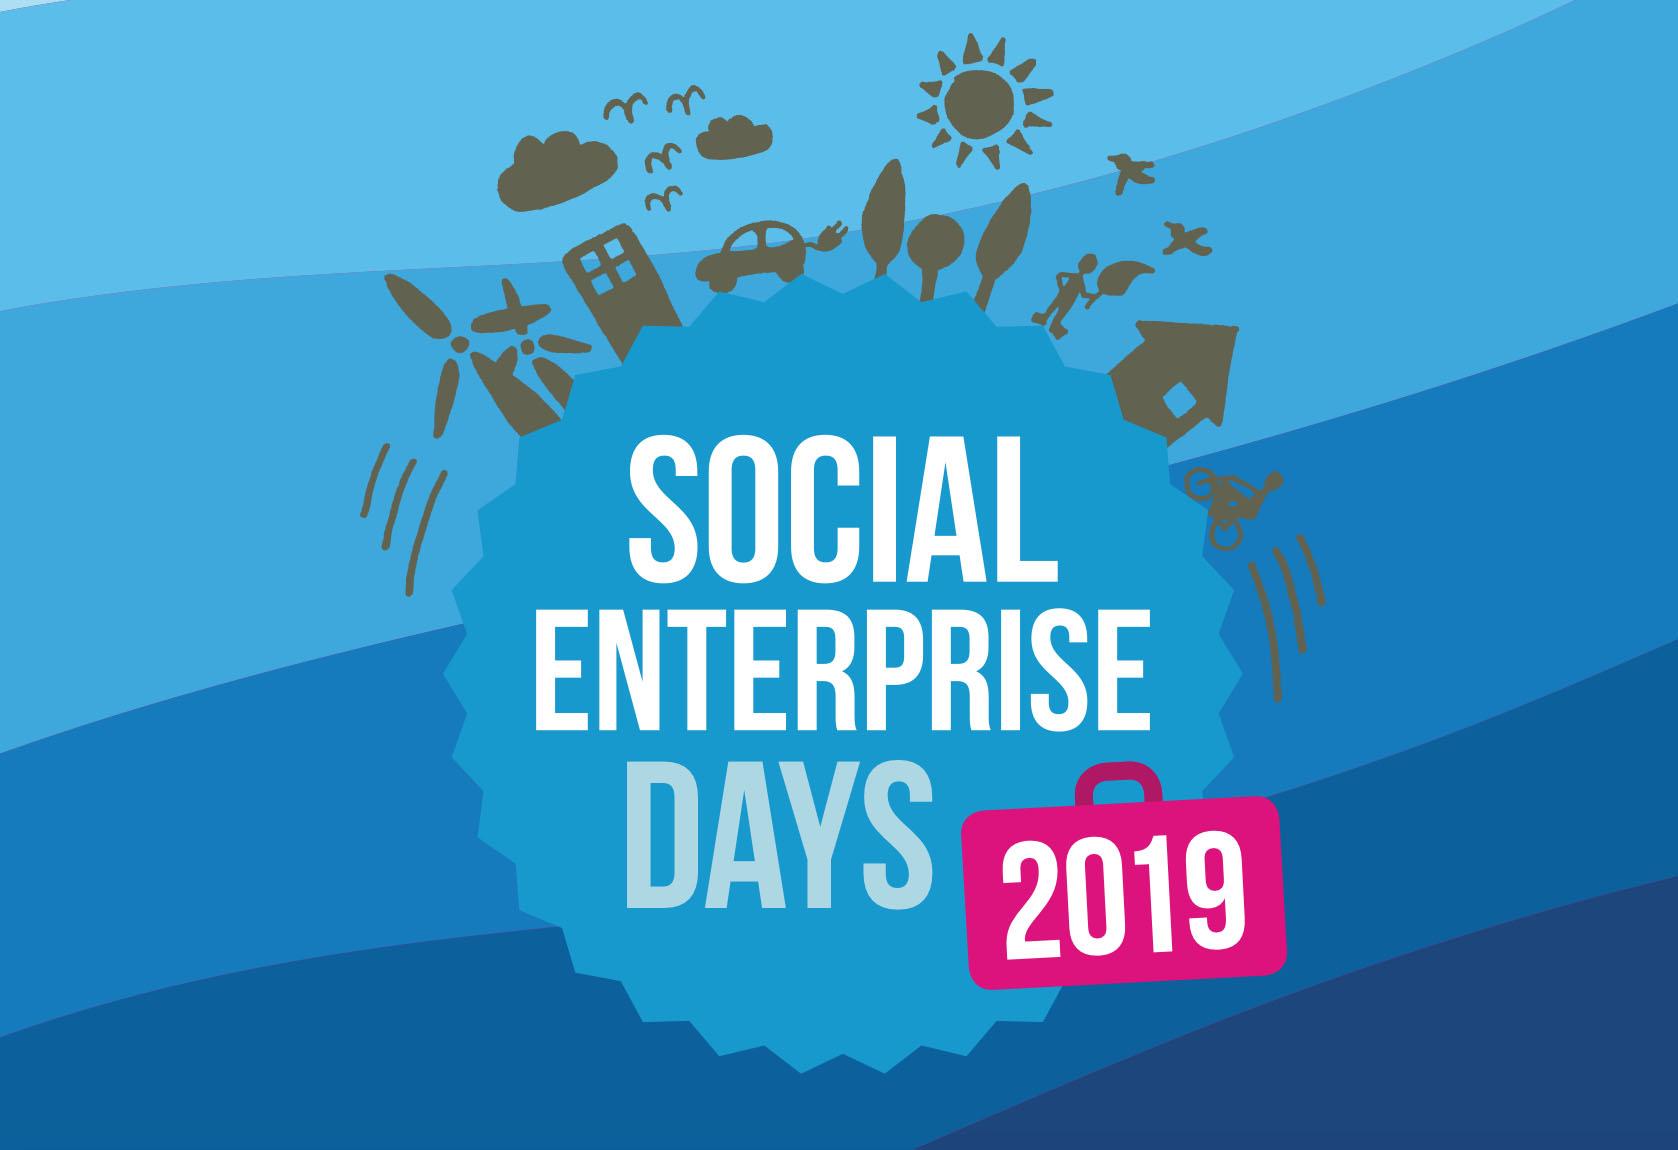 Social Enterprise Days 2019